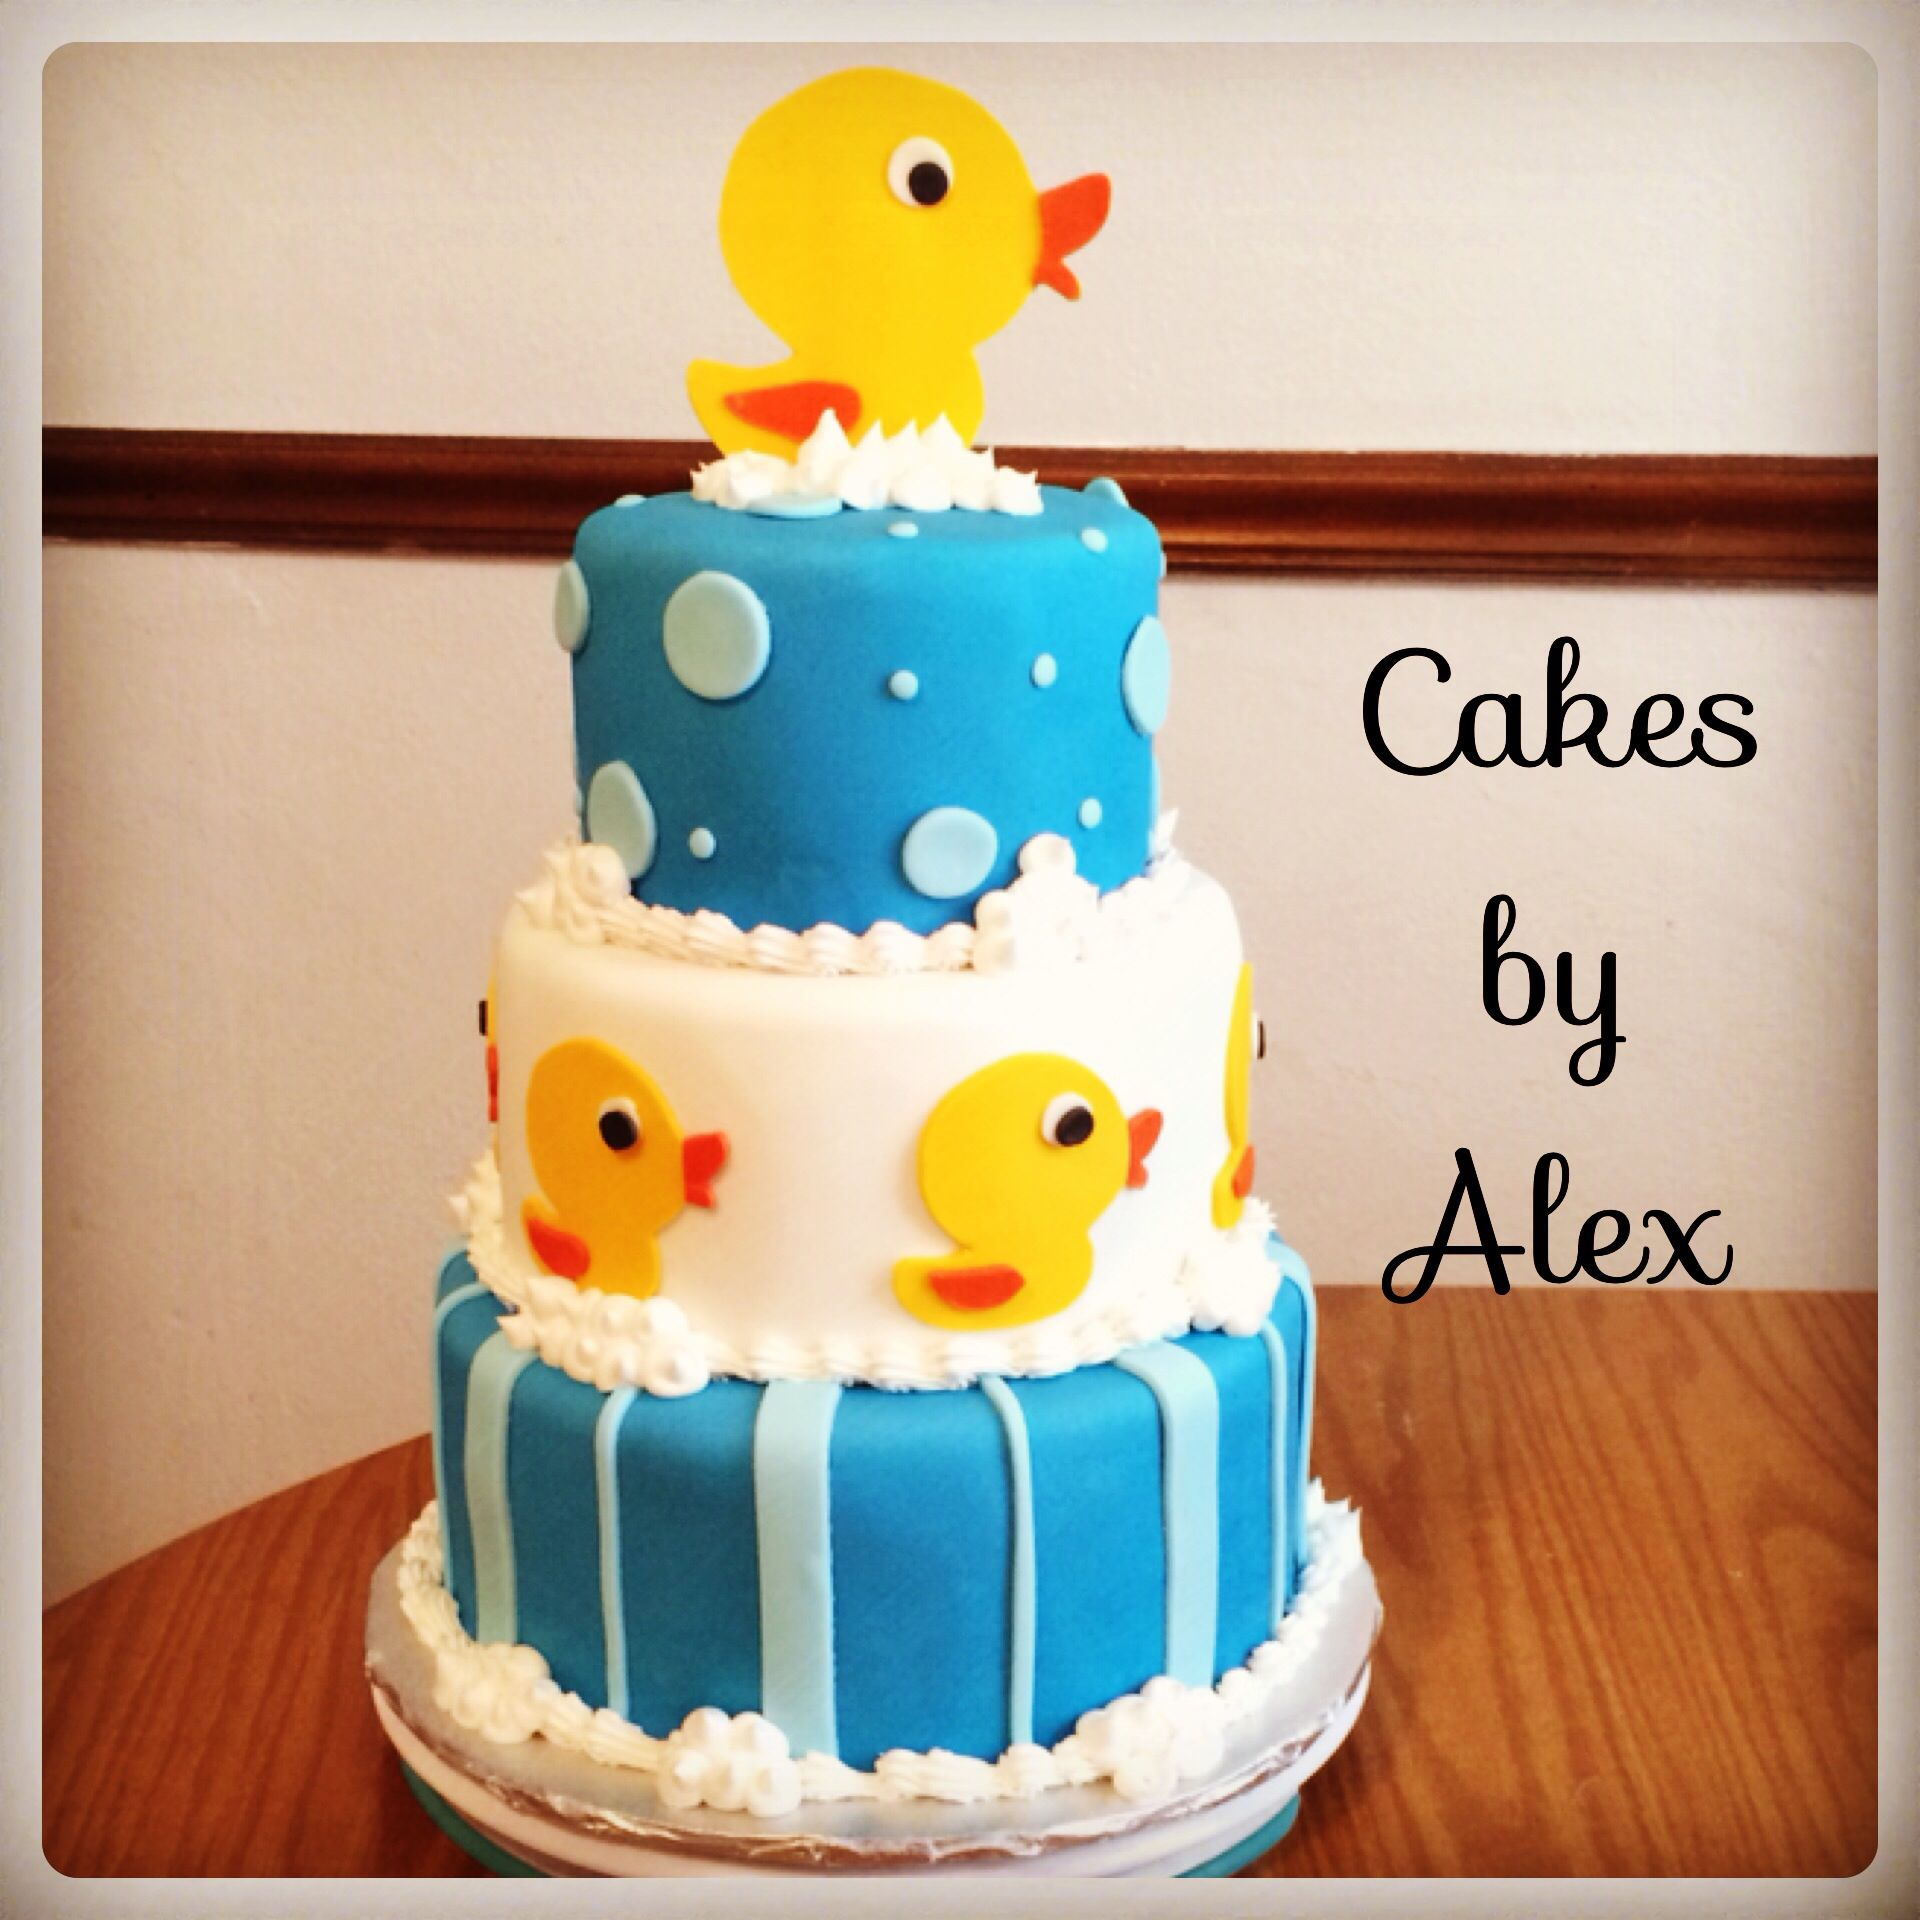 Baby Shower Cakes Kingston ~ Rubber ducky baby shower cake cakes